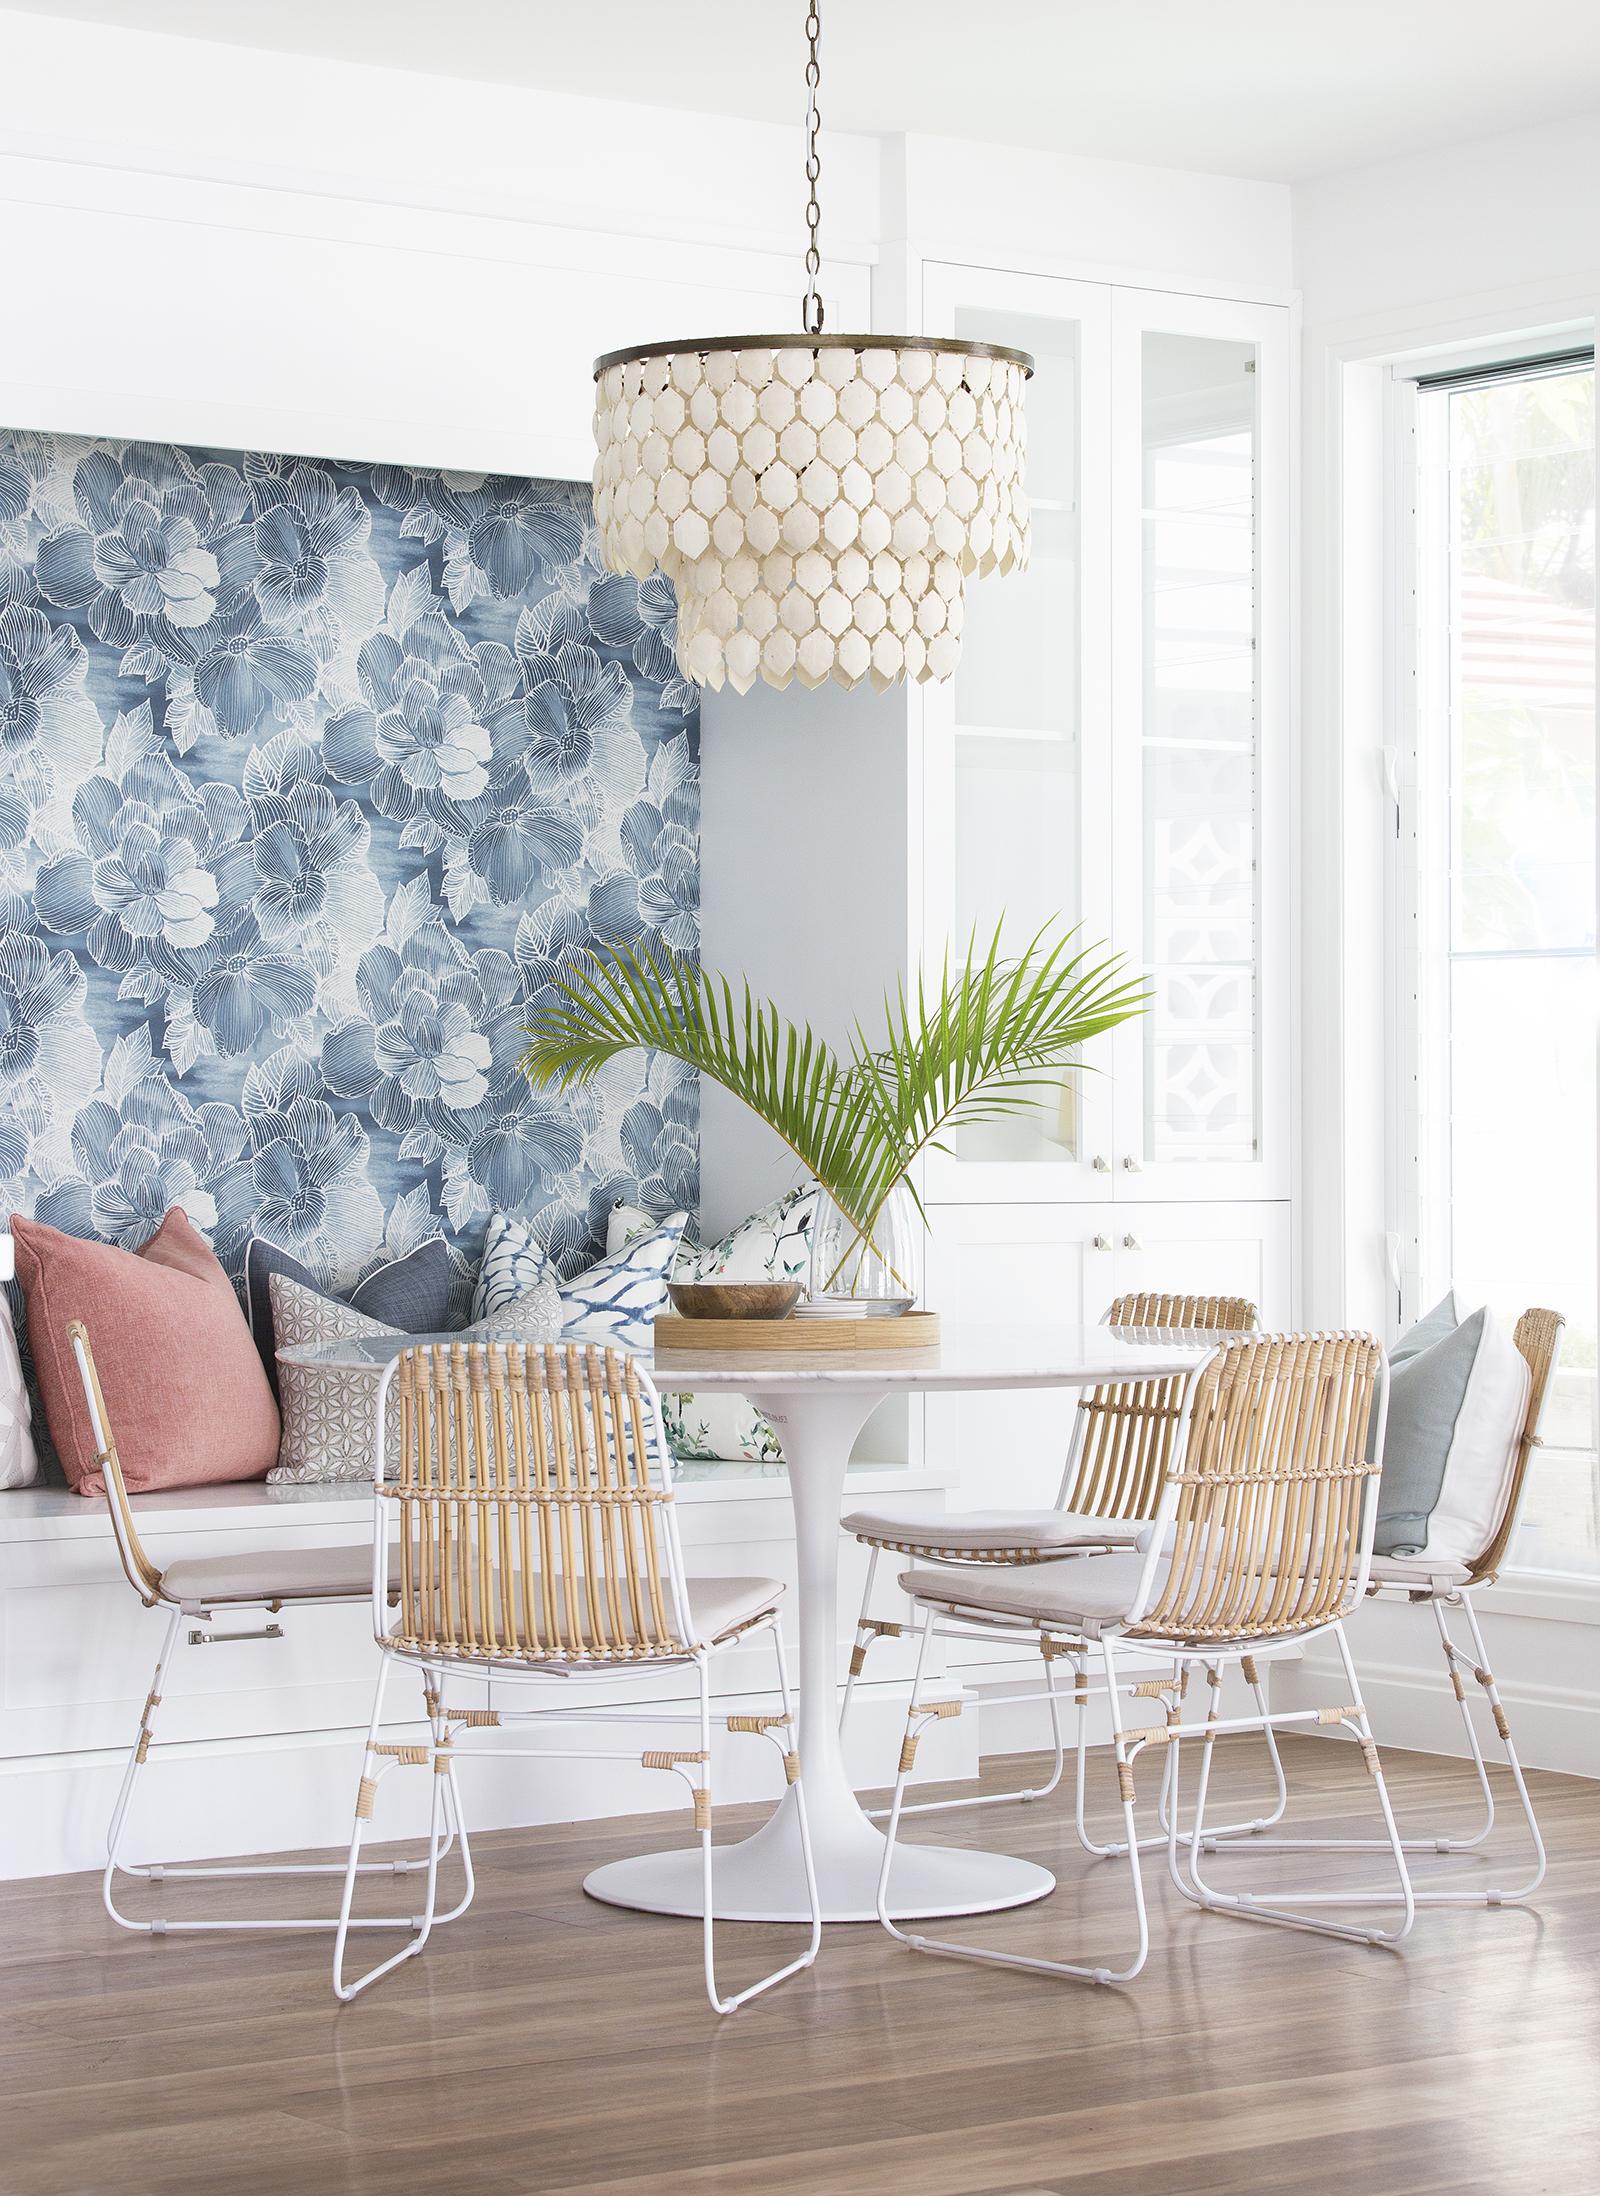 Kulu chairs from Uniqwa Furniture   Photography  Villa Styling  /   Design  Donna Guyler